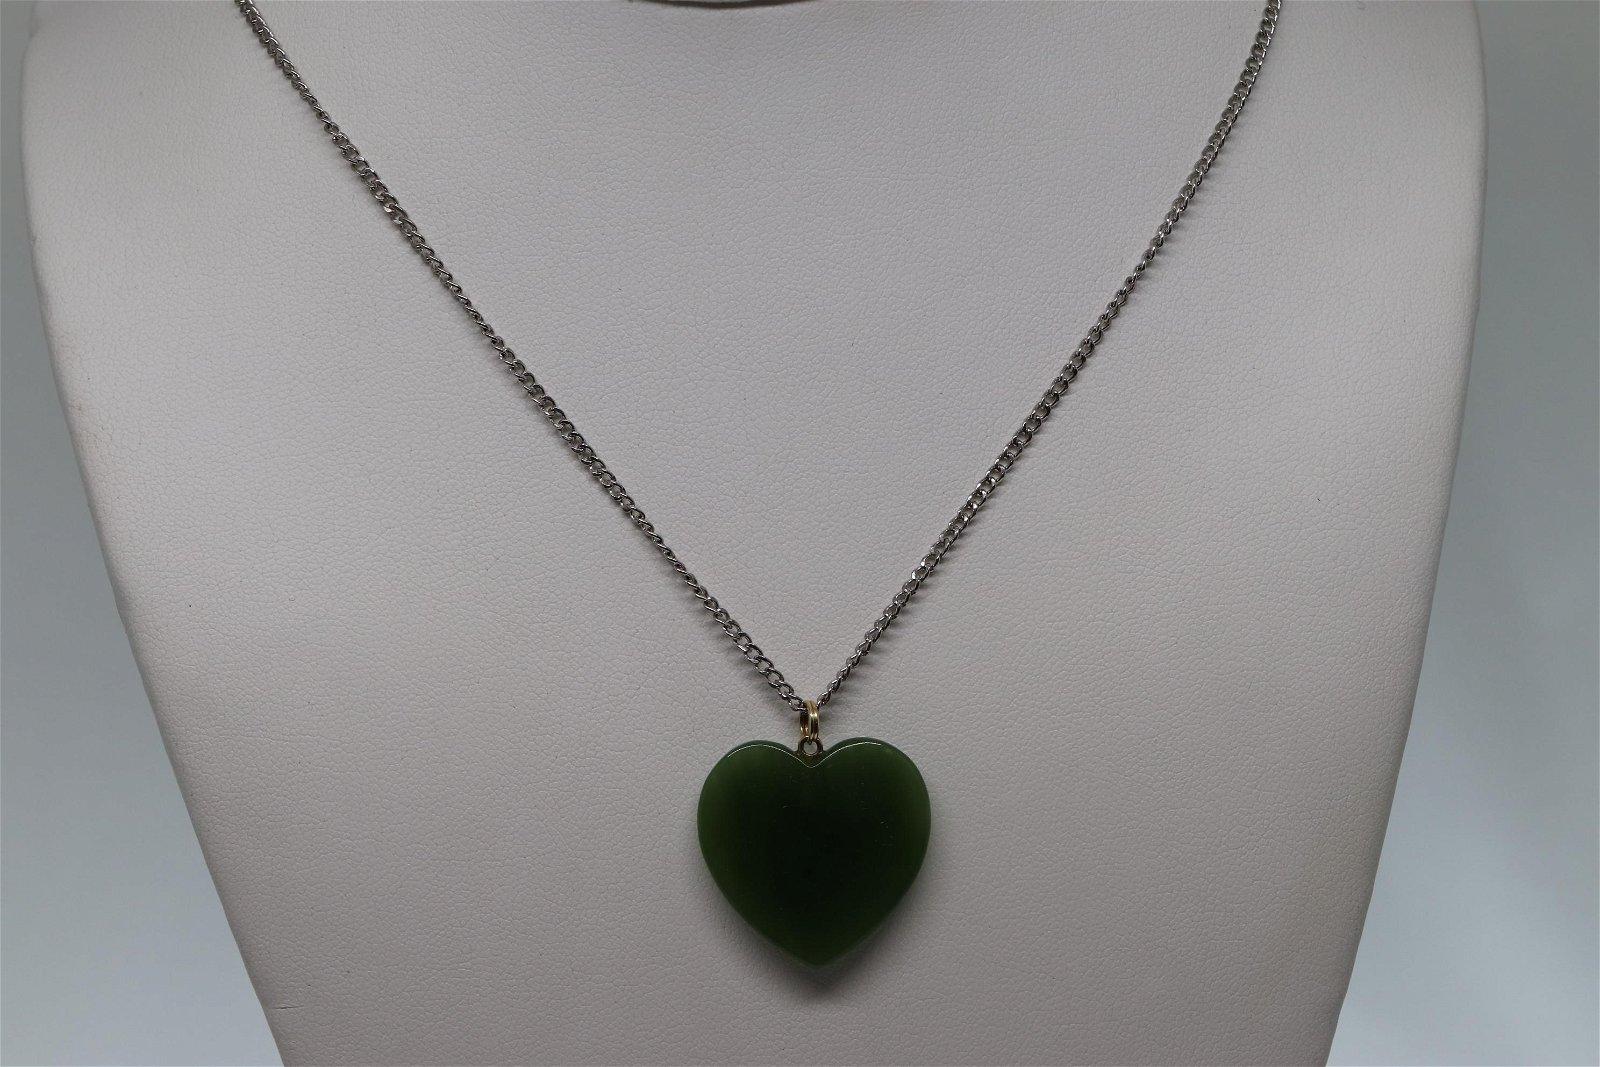 14kt & Silver Jade Necklace